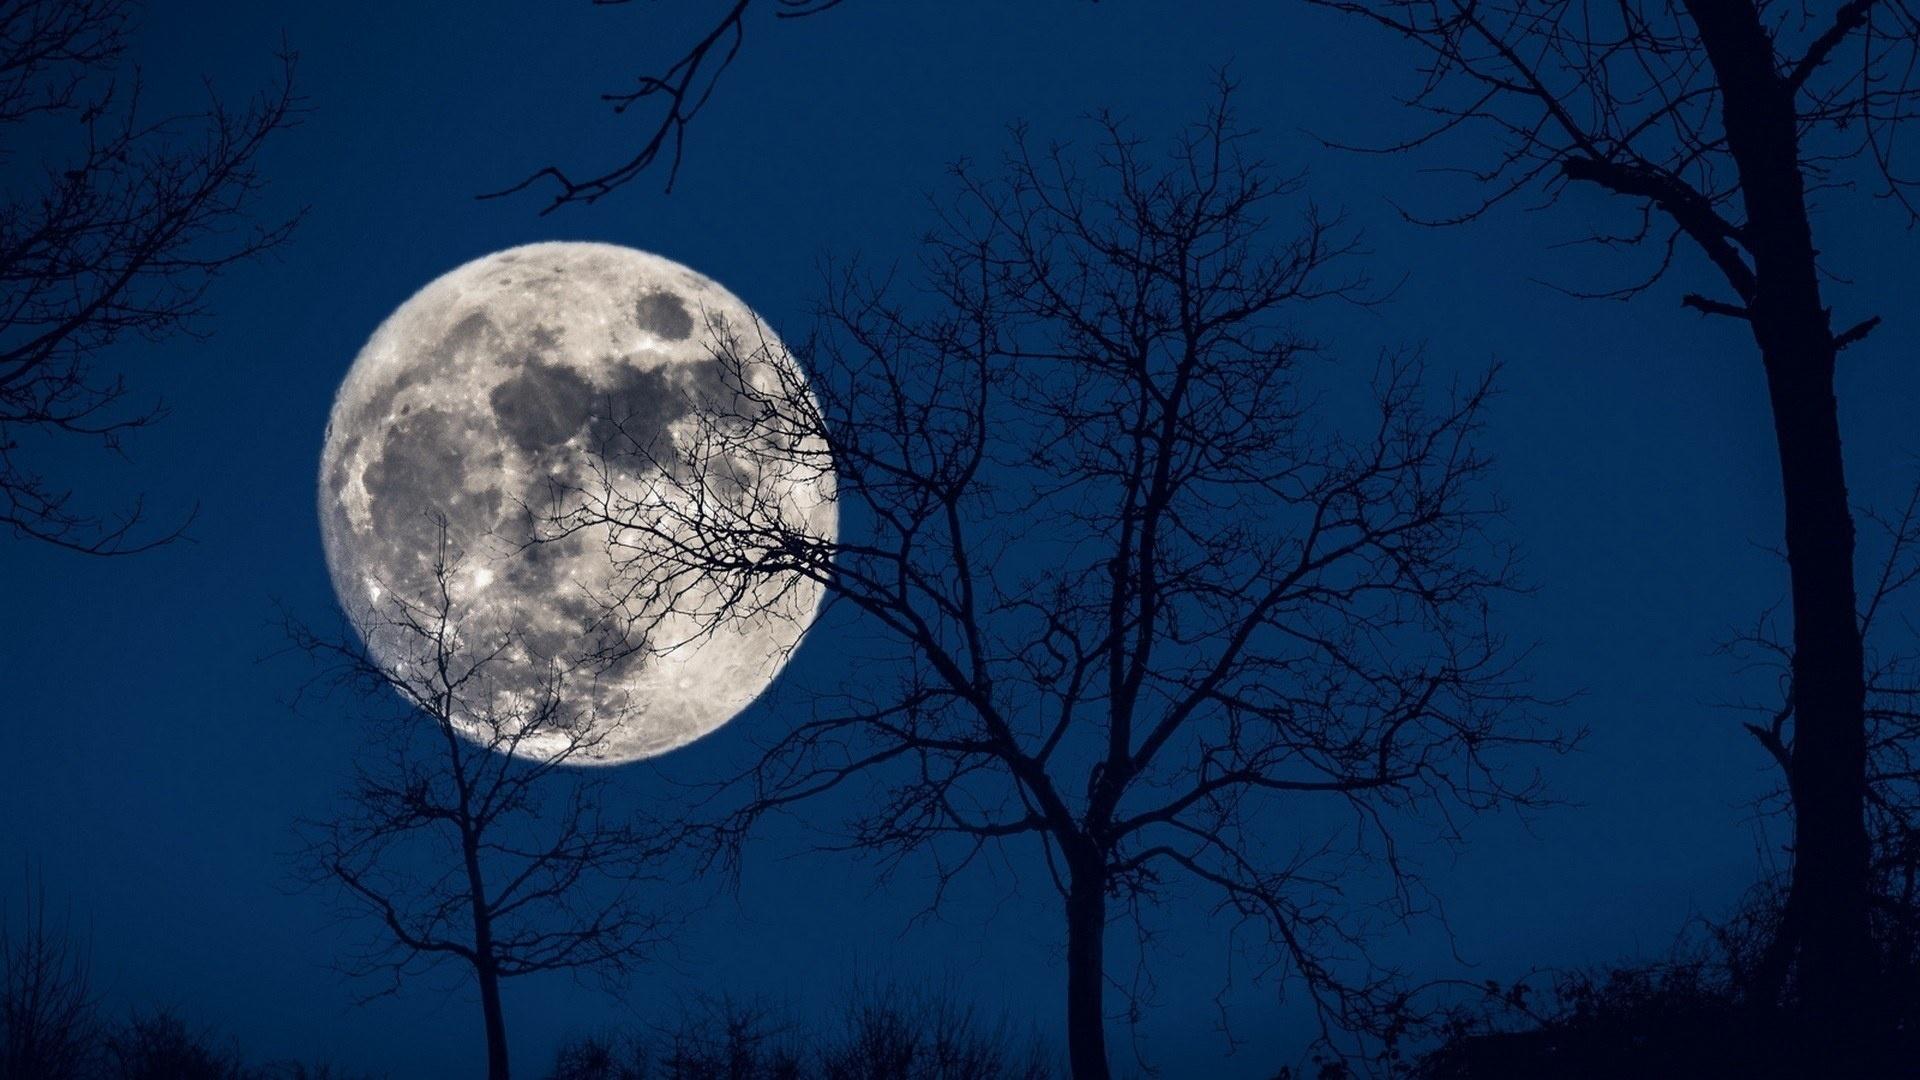 картинки ночь полнолуние нам